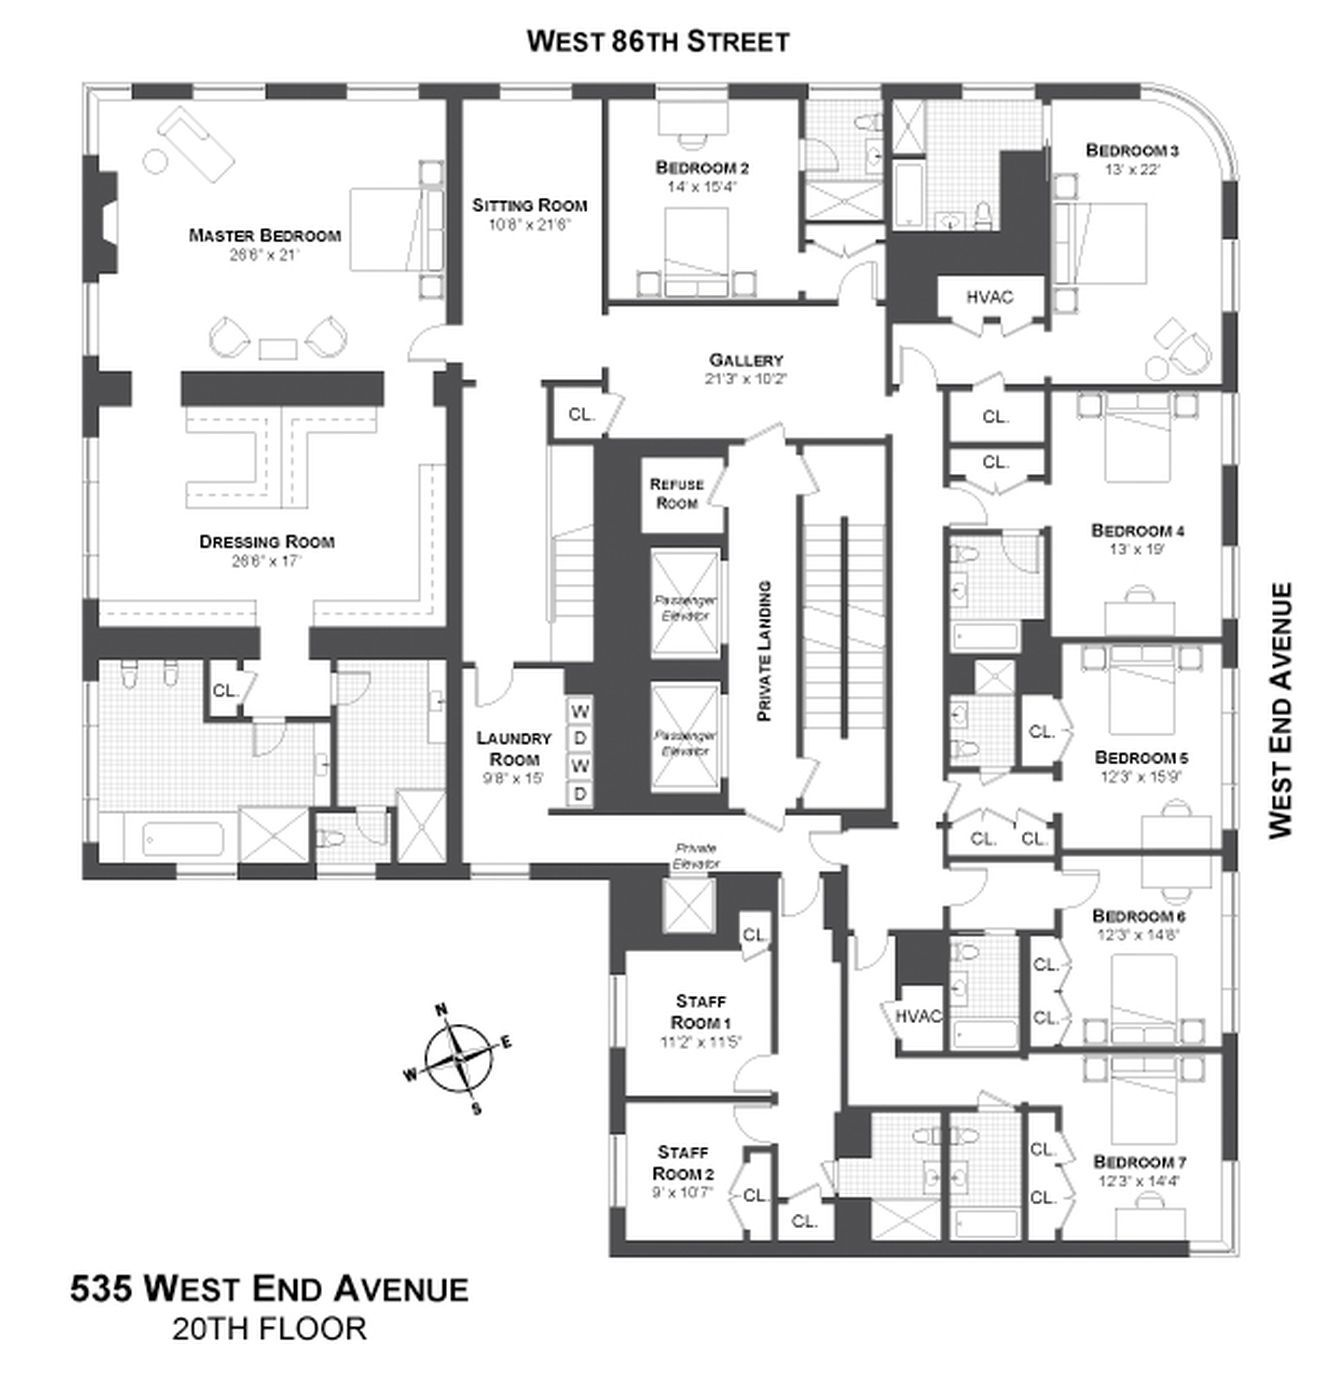 West End Avenue's $37.5M Megapenthouse Splits In Two